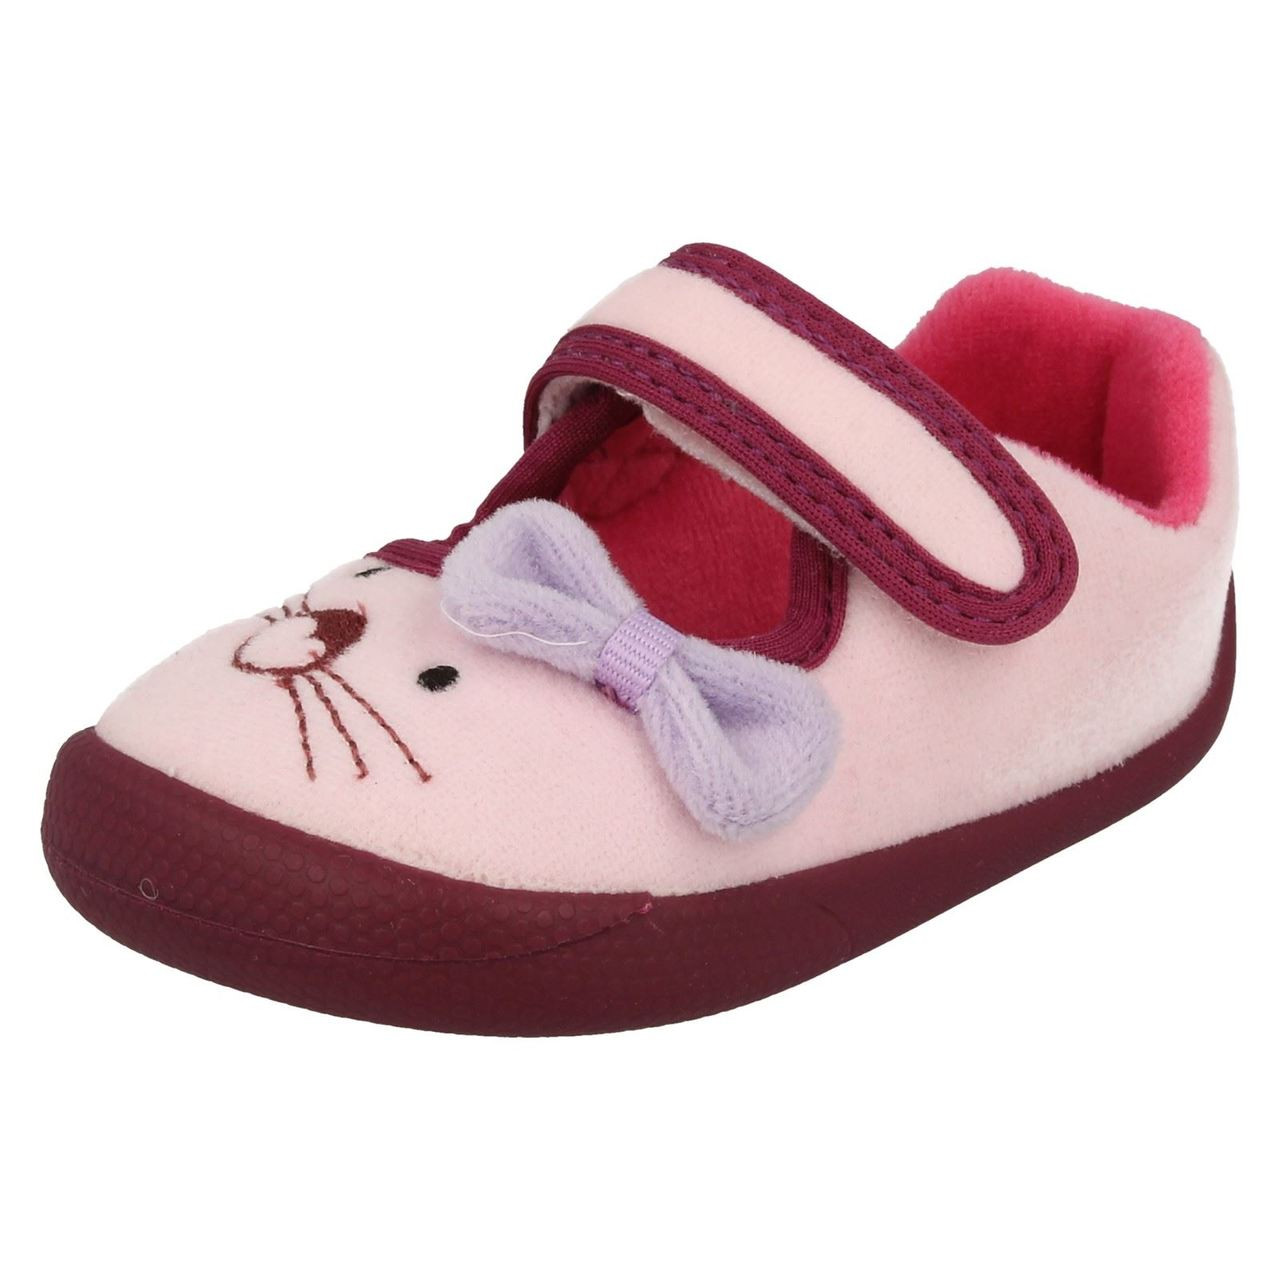 Infant Clarks Girls Slippers /'Magical Sleep/'